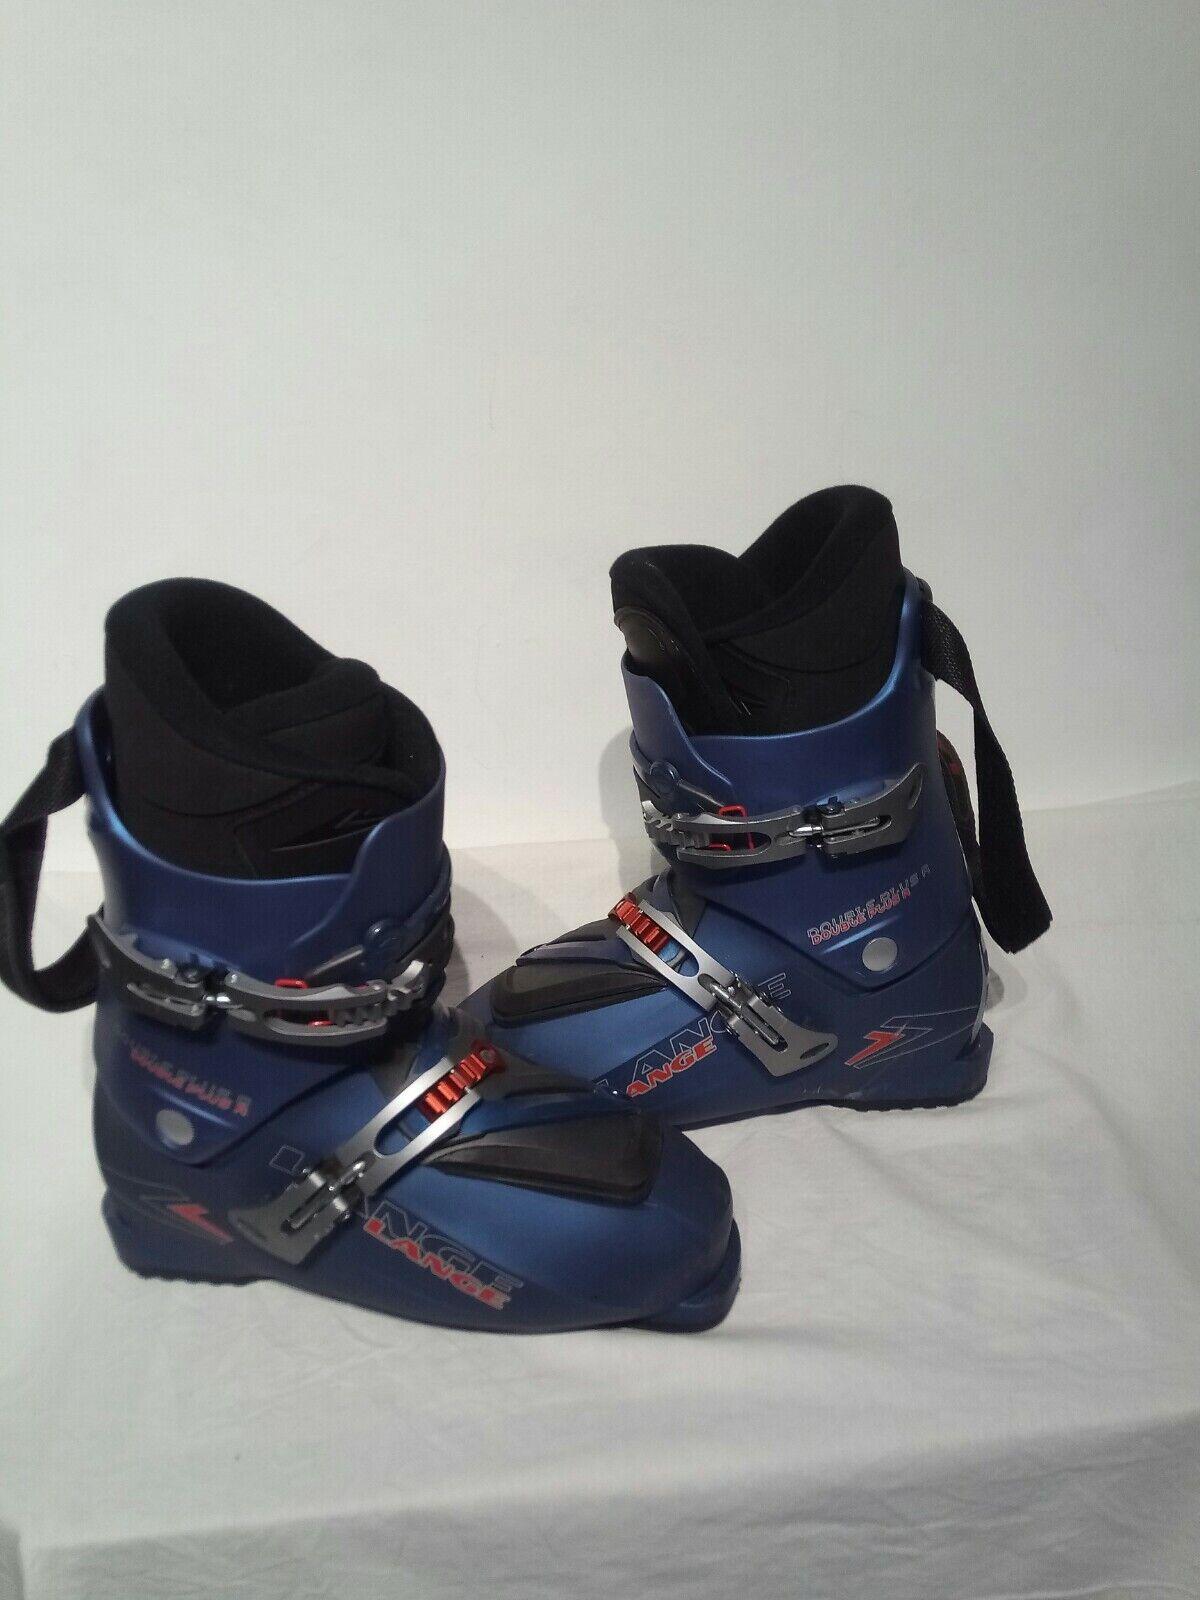 Lance R00137999 Double Plus R Mens bluee Ski Boots Size 329mm